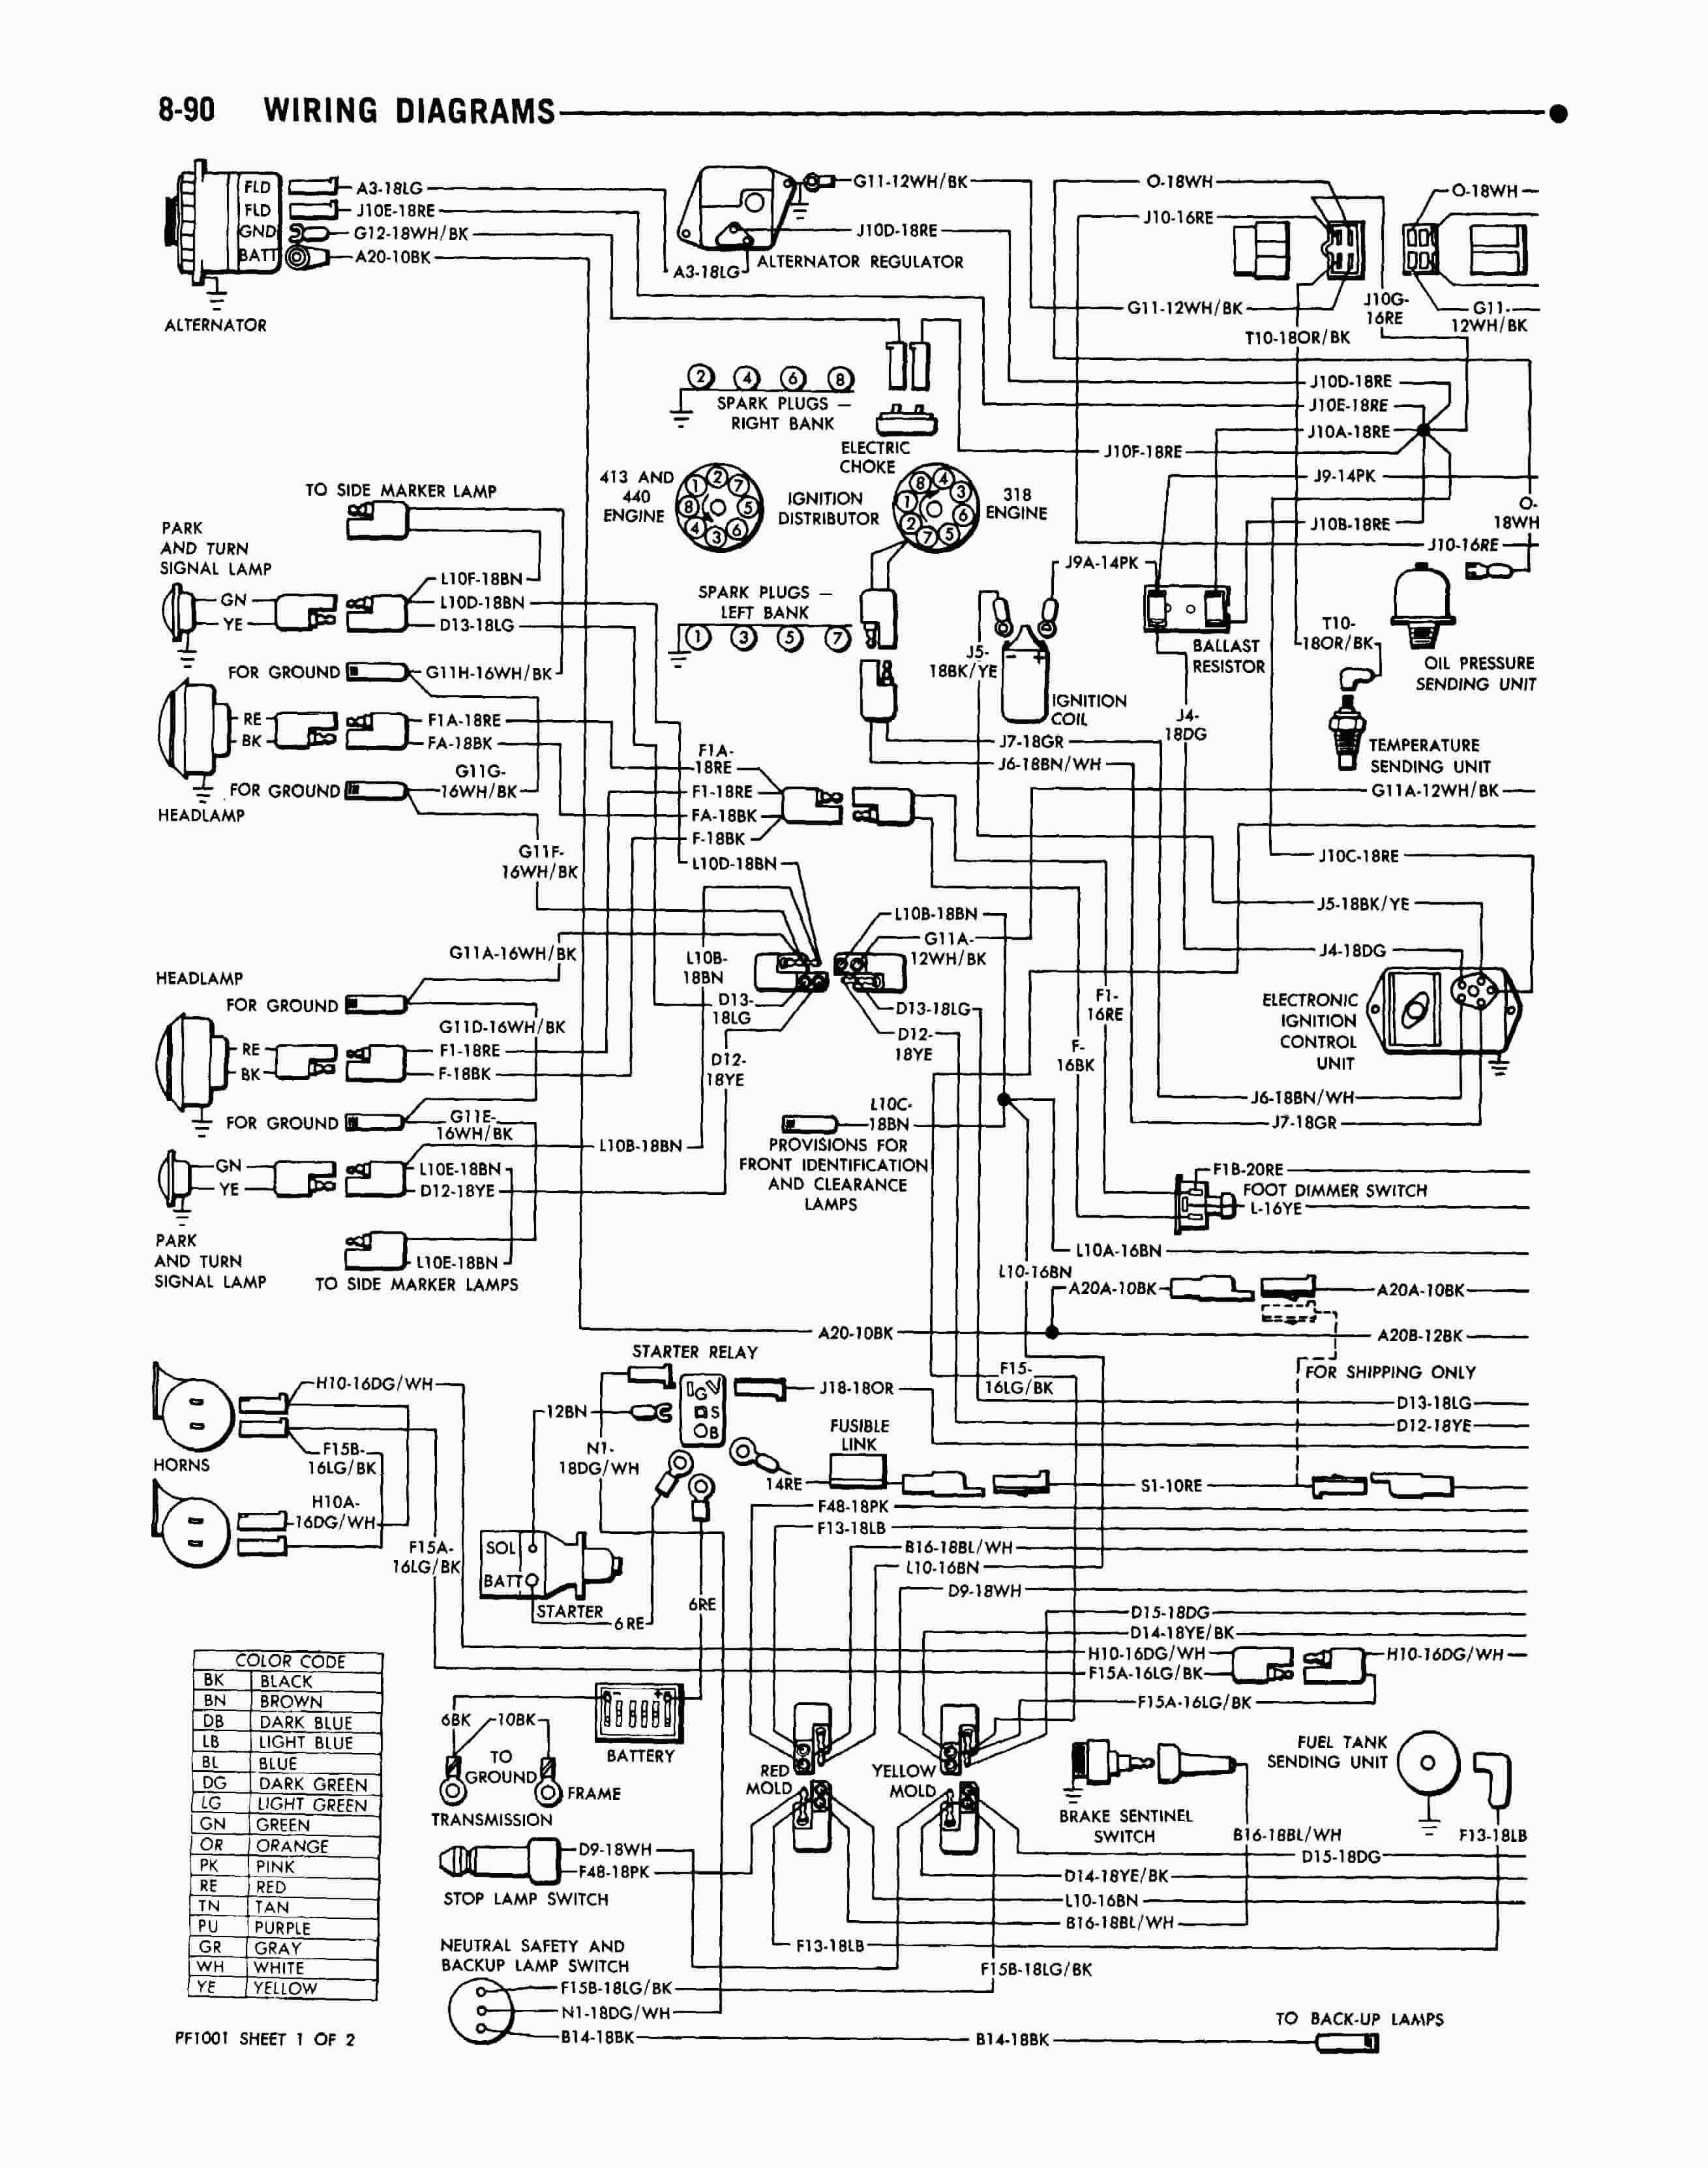 diagram] 1985 plymouth reliant wiring diagram full version hd quality wiring  diagram - 1ptbwiring1.lalibrairiedelouviers.fr  1ptbwiring1.lalibrairiedelouviers.fr